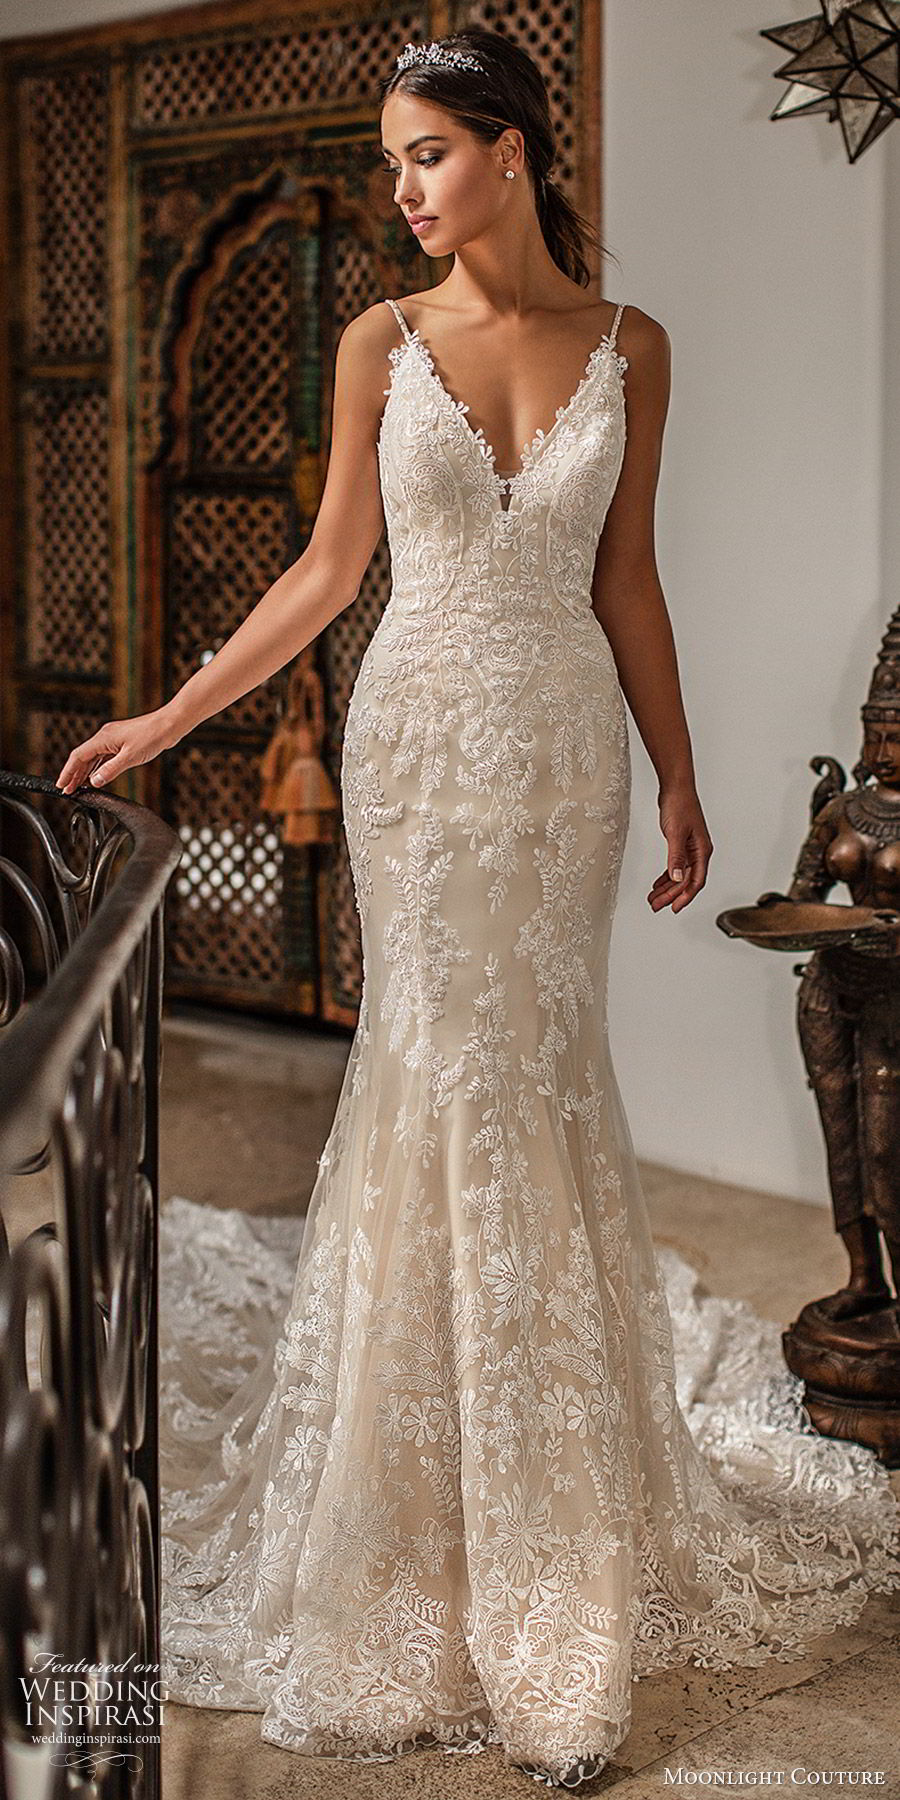 moonlight couture fall 2019 bridal sleeveless thin straps v neckline fully embellished lace sheath fit flare mermaid wedding dress (4) elegant low back chapel train champagne mv